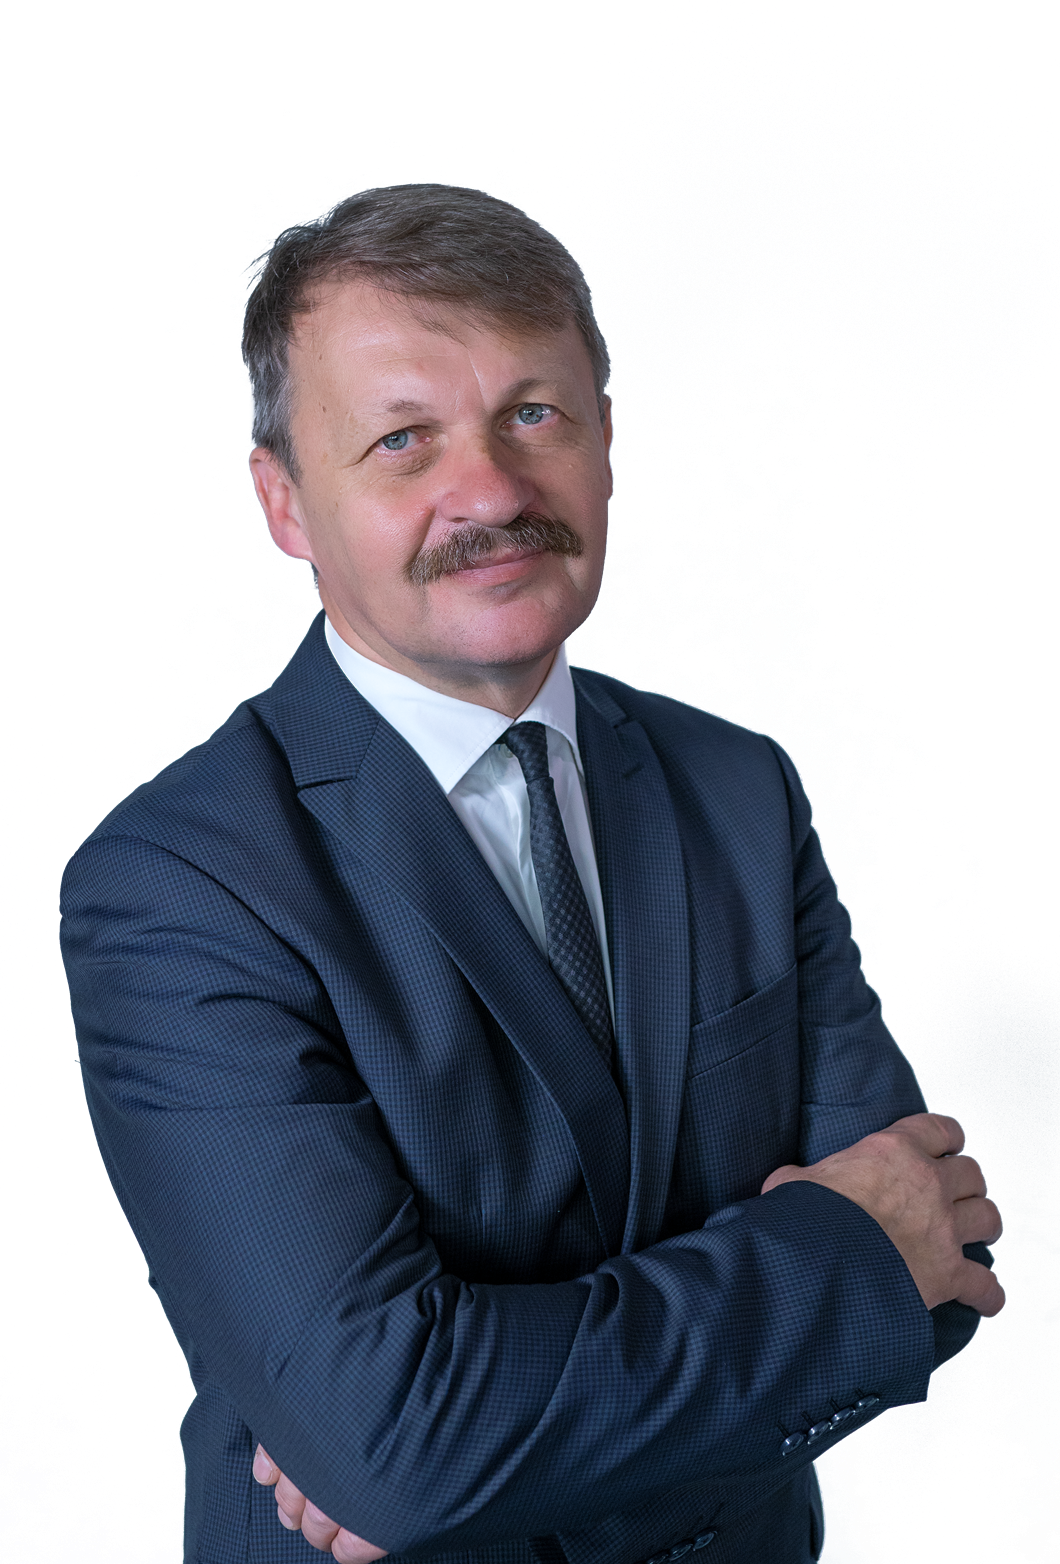 Stanisław Konsek